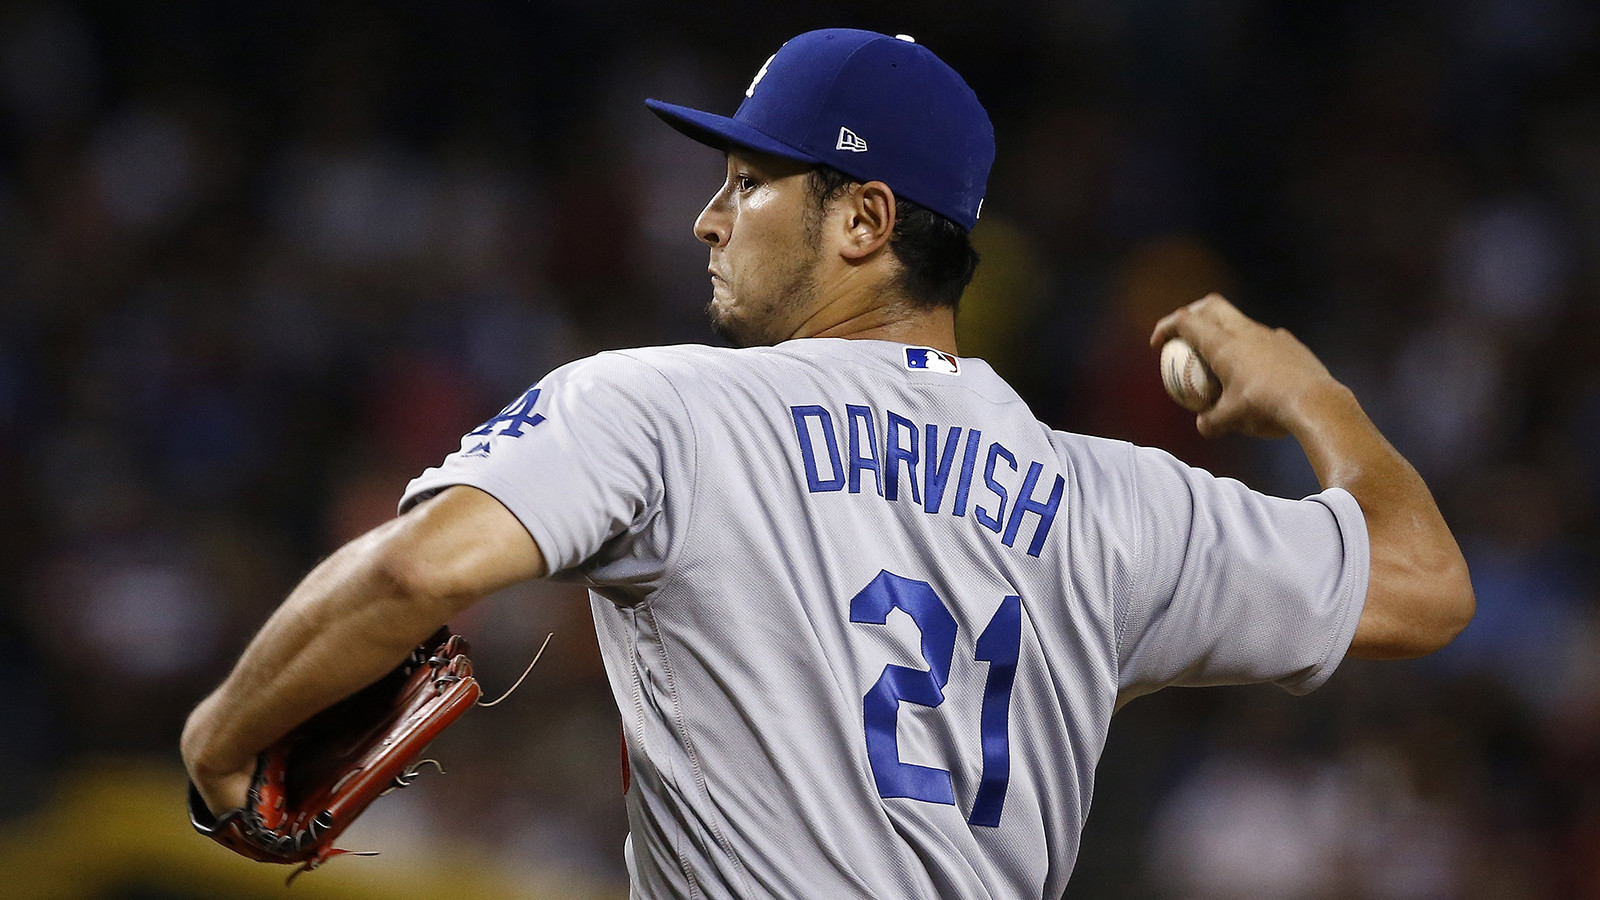 La-sp-dodgers-report-darvish-20170819